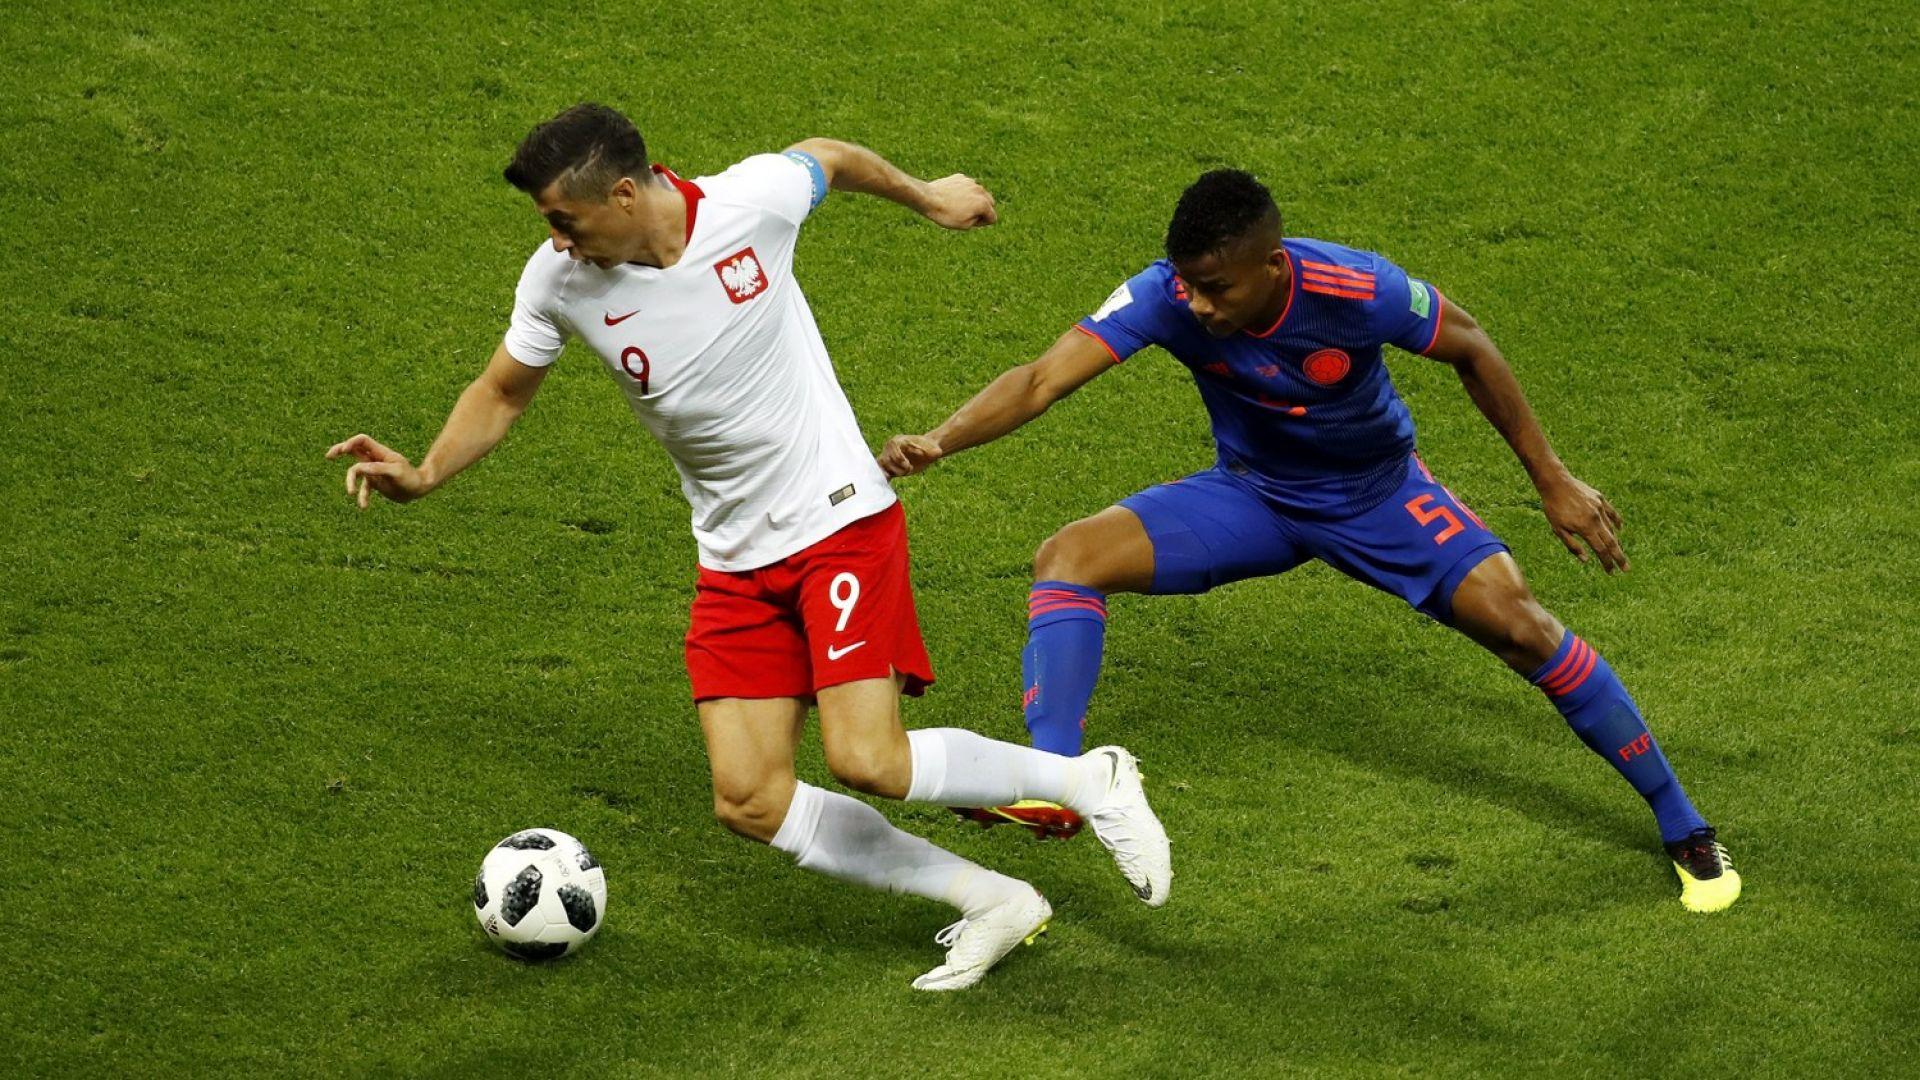 Полша - Колумбия 0:3 (статистика)